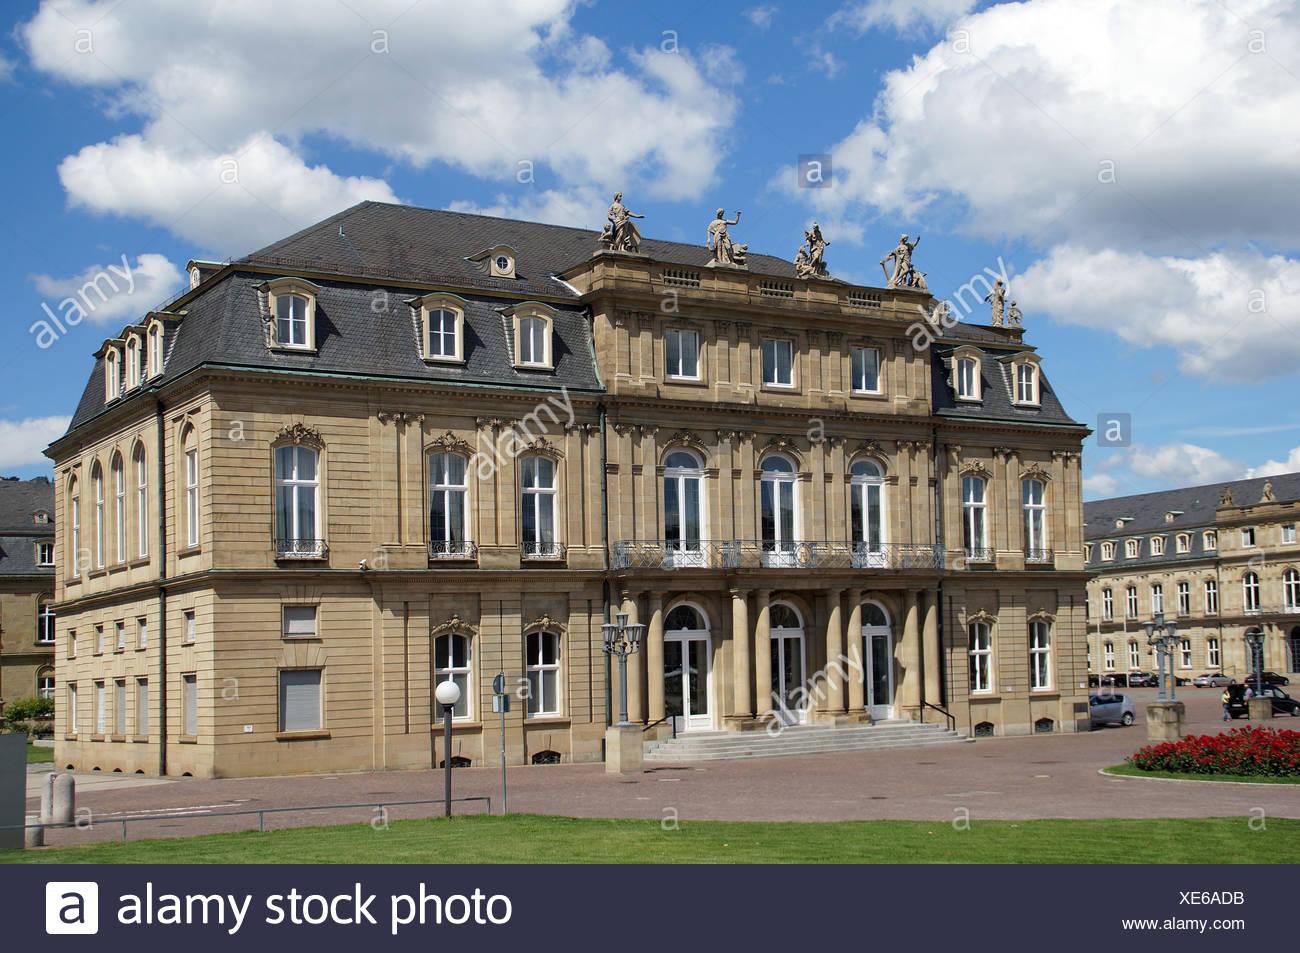 New Palace Stuttgart - side panel - Stock Image